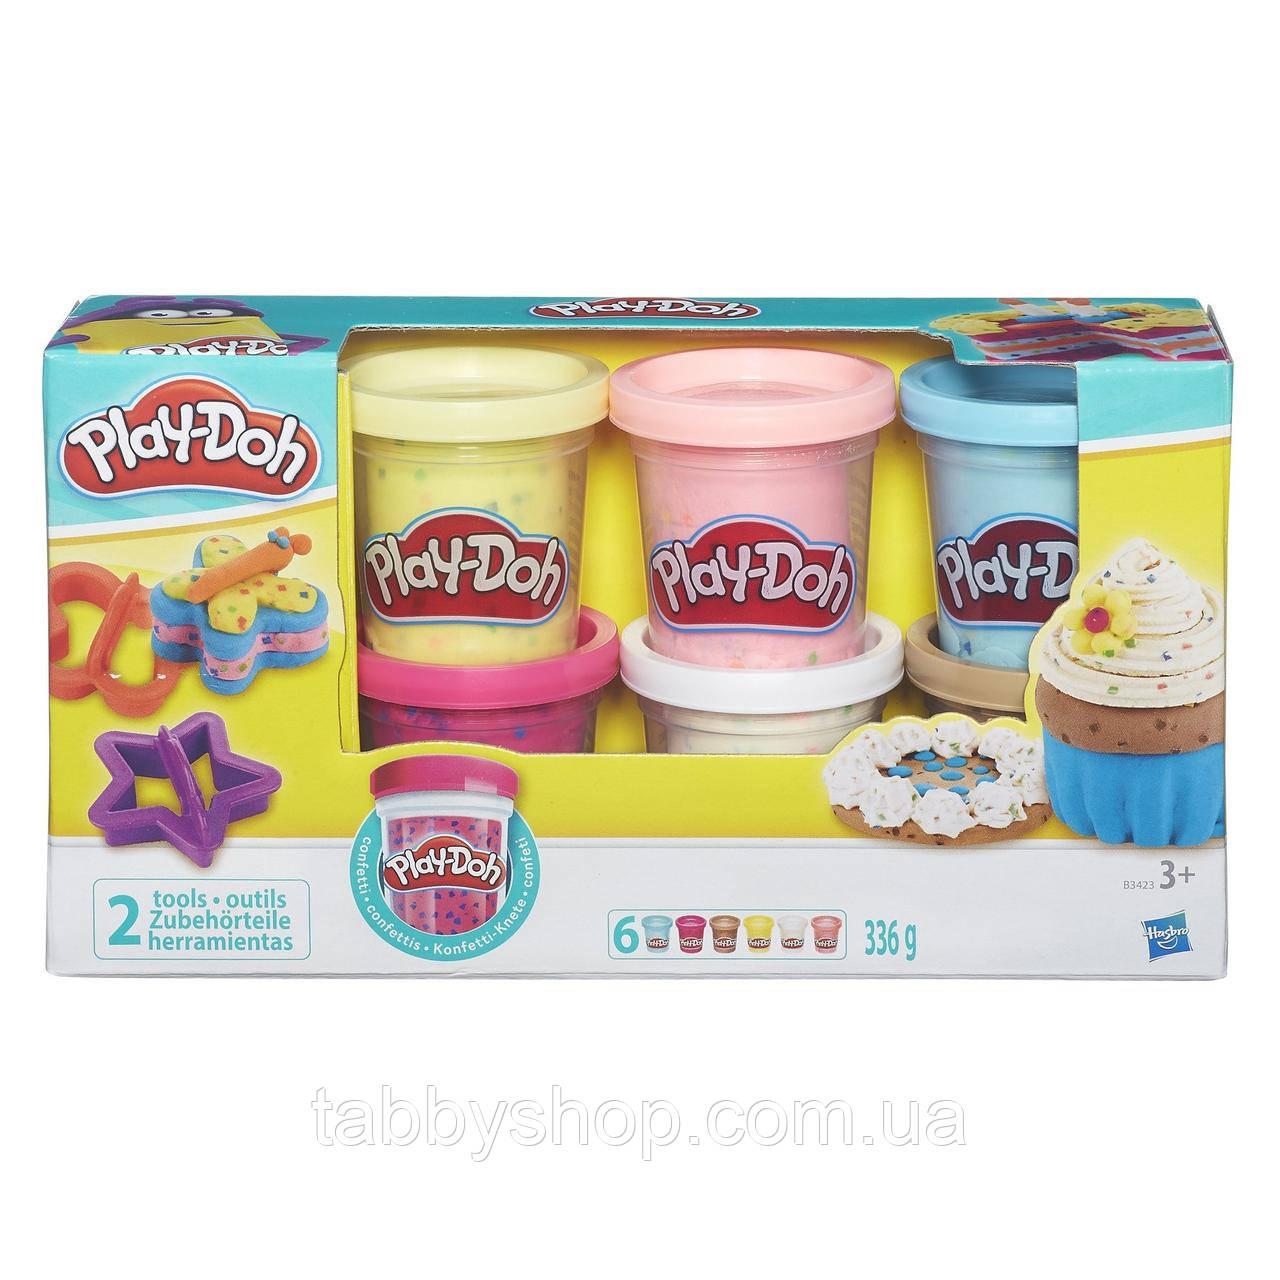 Набор пластилина 6 баночек с конфетти HASBRO Play Doh